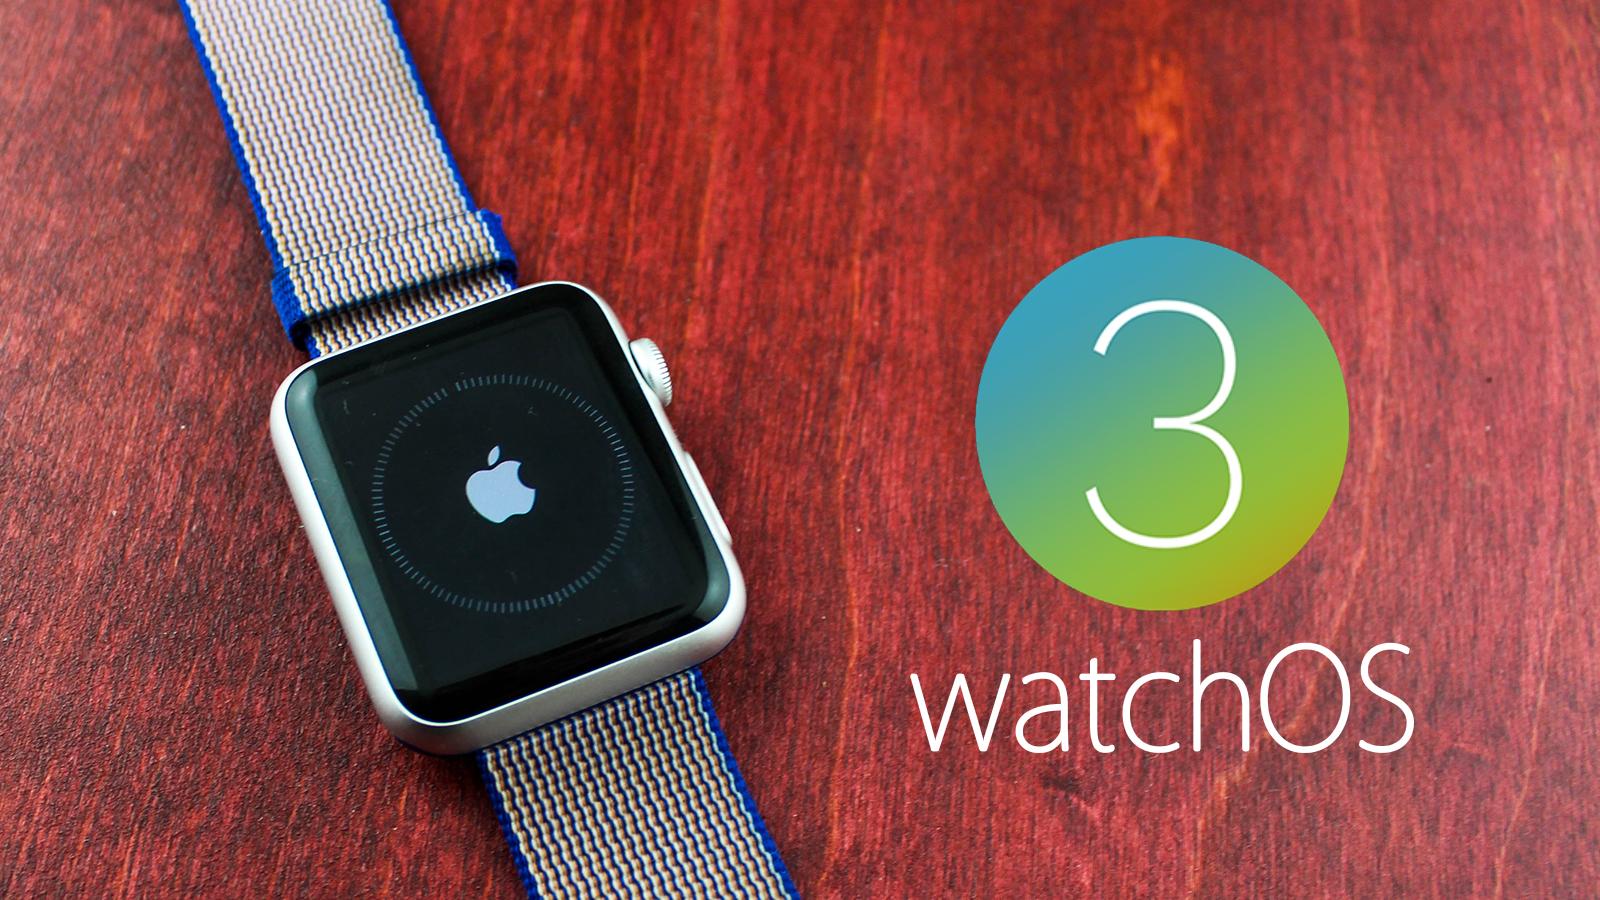 Watchos 3 major update now available - Watchos 3 Major Update Now Available 53